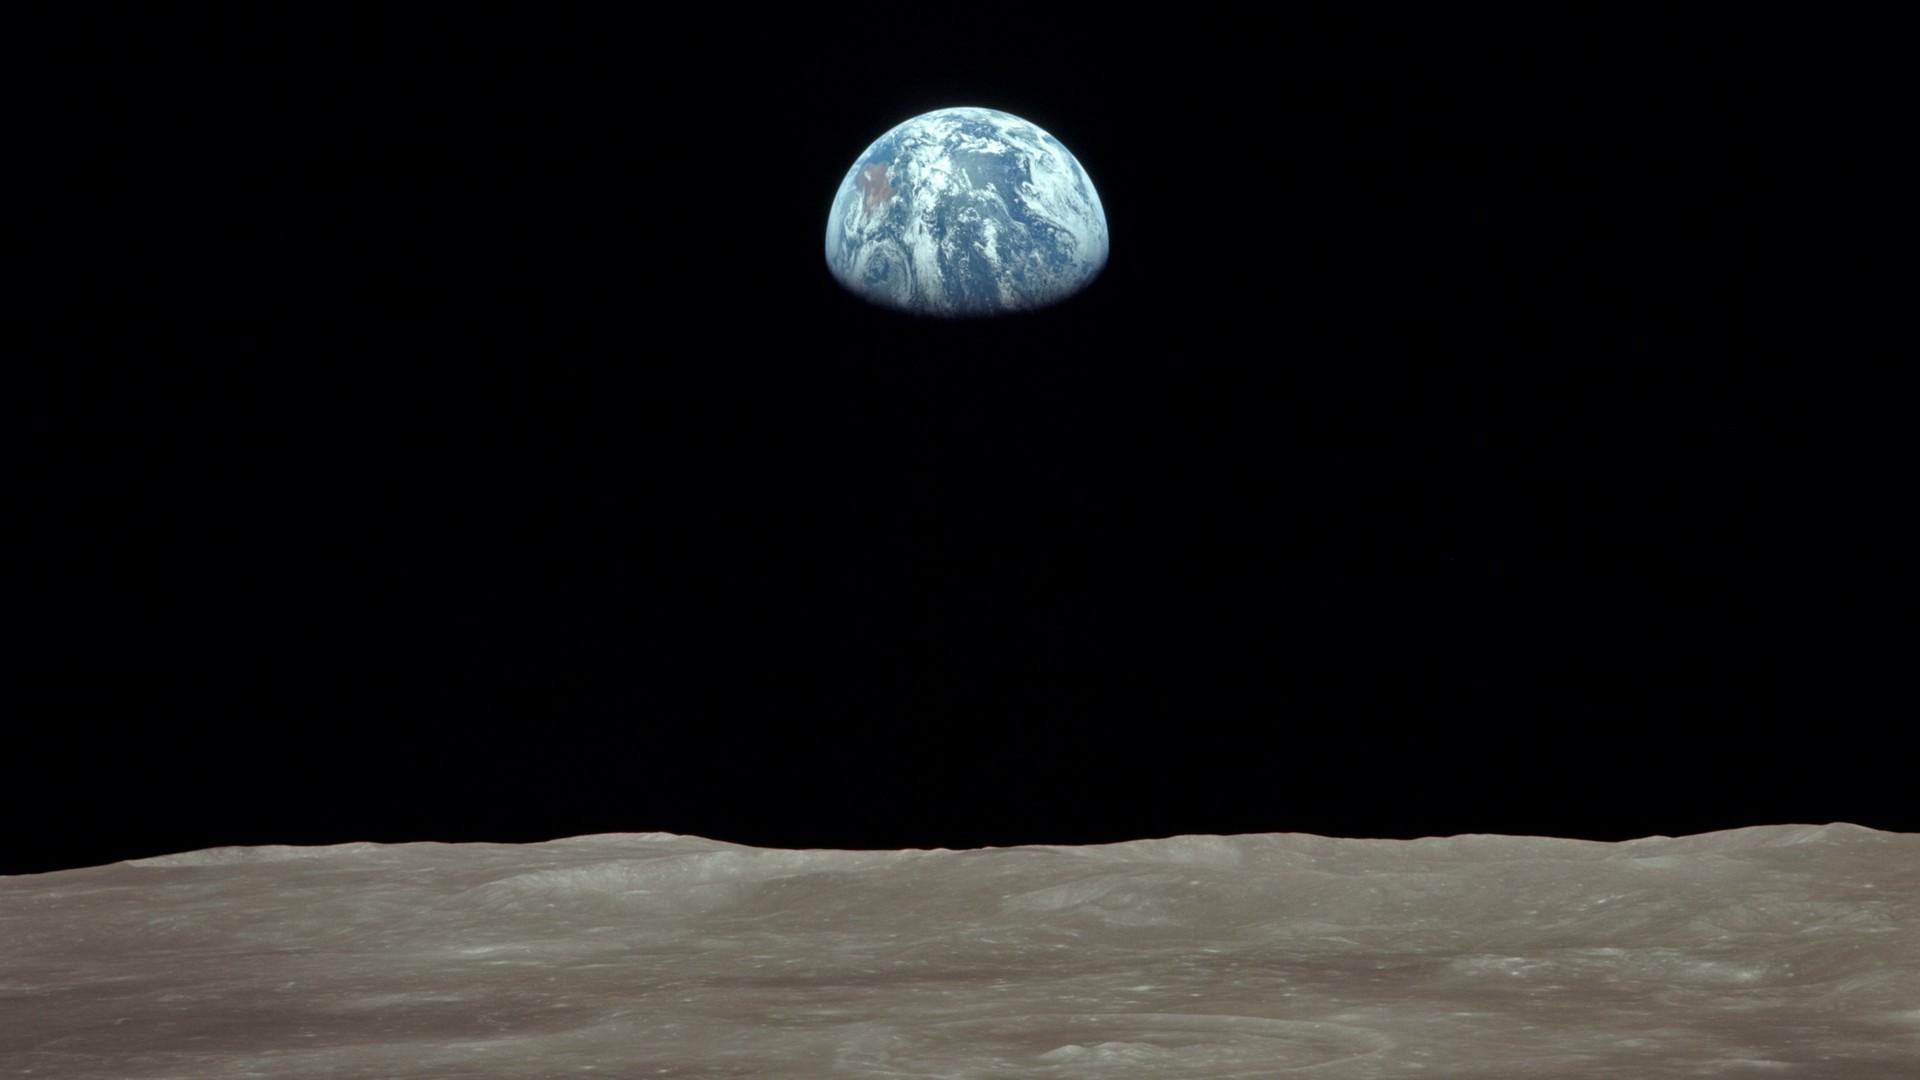 Res: 1920x1080, Earth moon nasa astronomy earthrise wallpaper